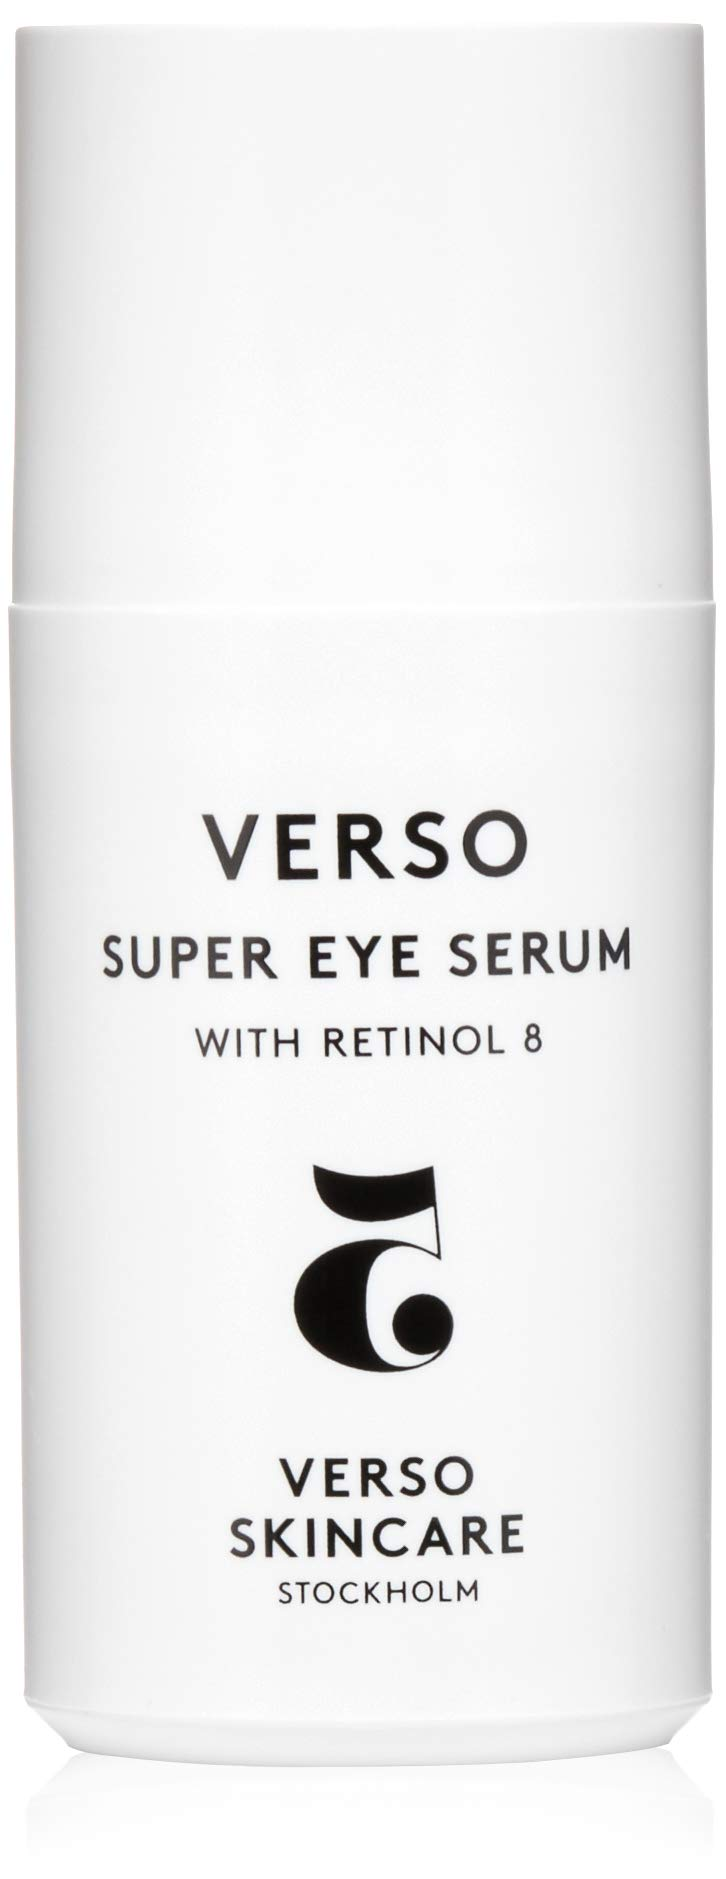 Verso Skincare Super Eye Serum 1 Oz by Verso Skincare